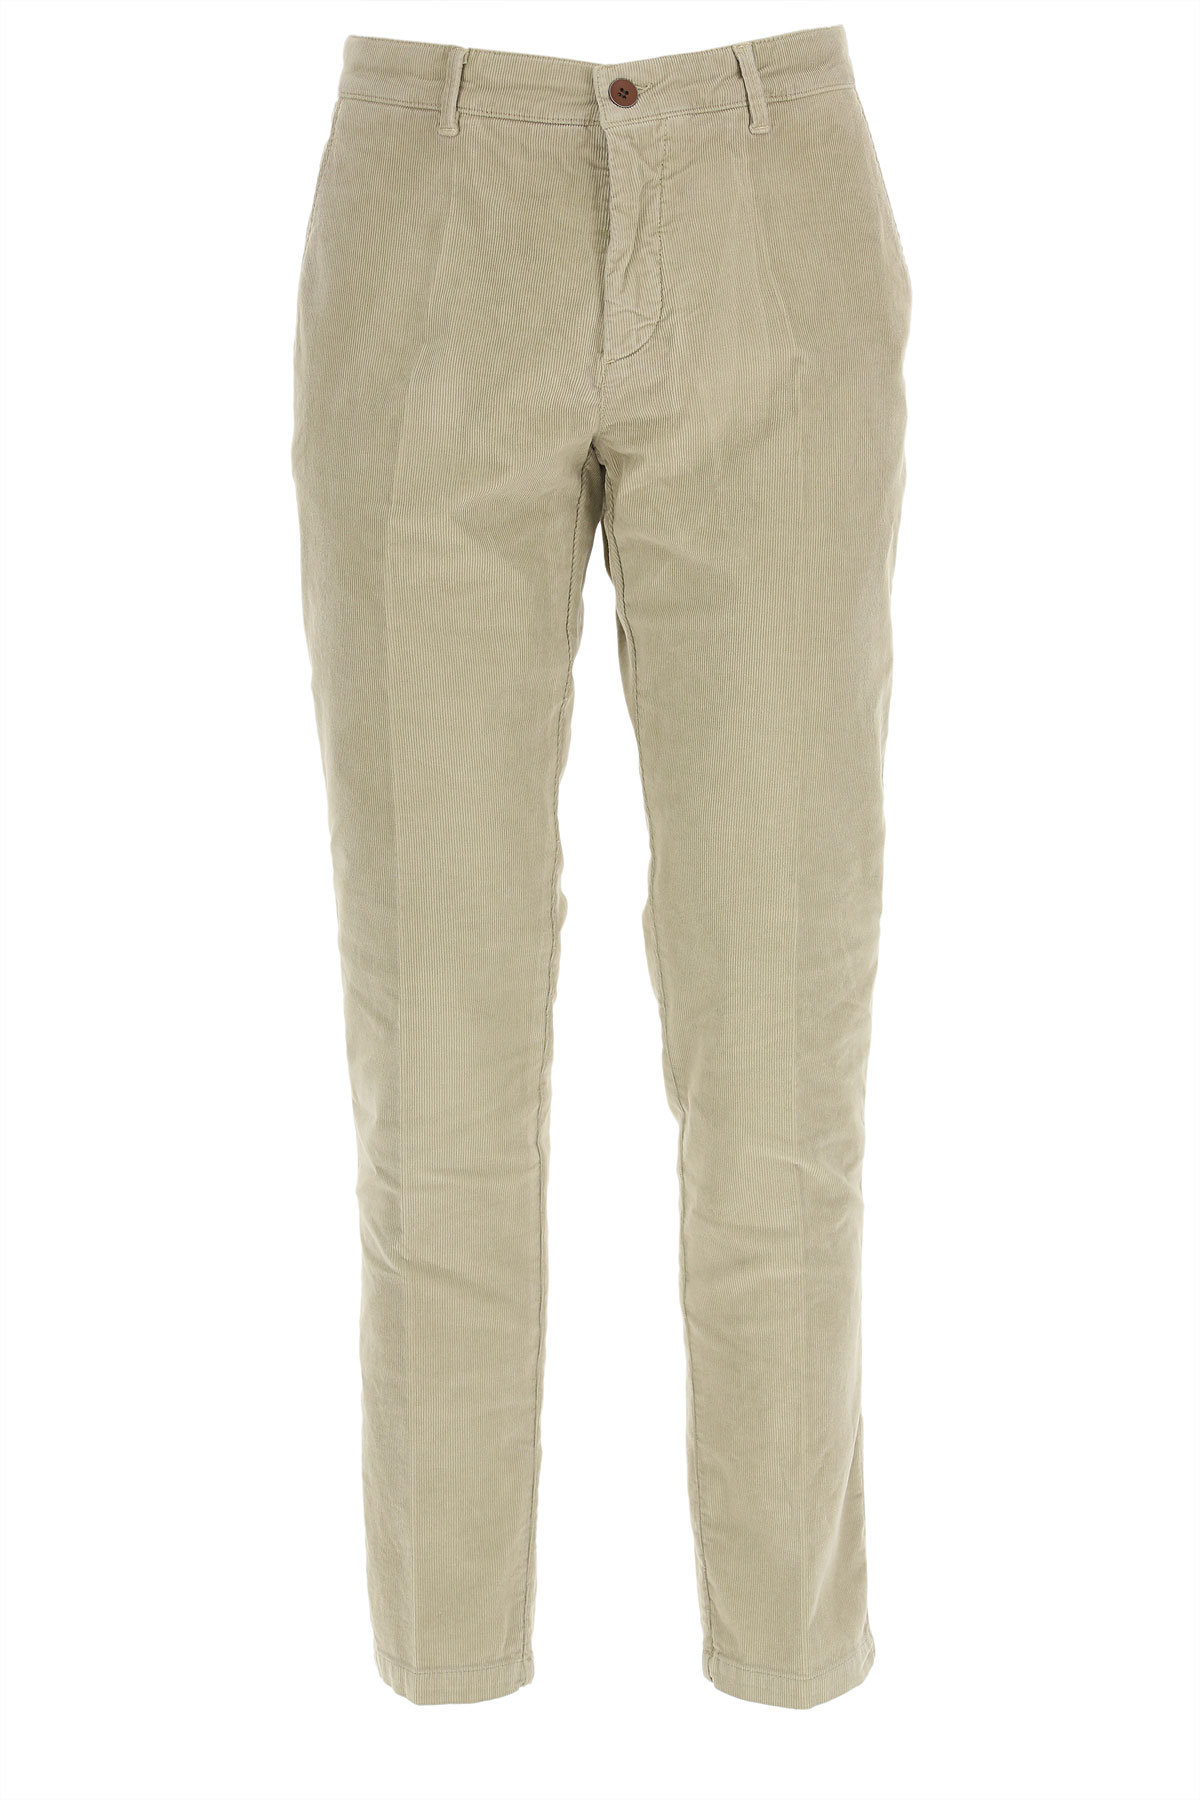 Brooksfield Pants for Men On Sale, Beige, Cotton, 2019, 32 34 38